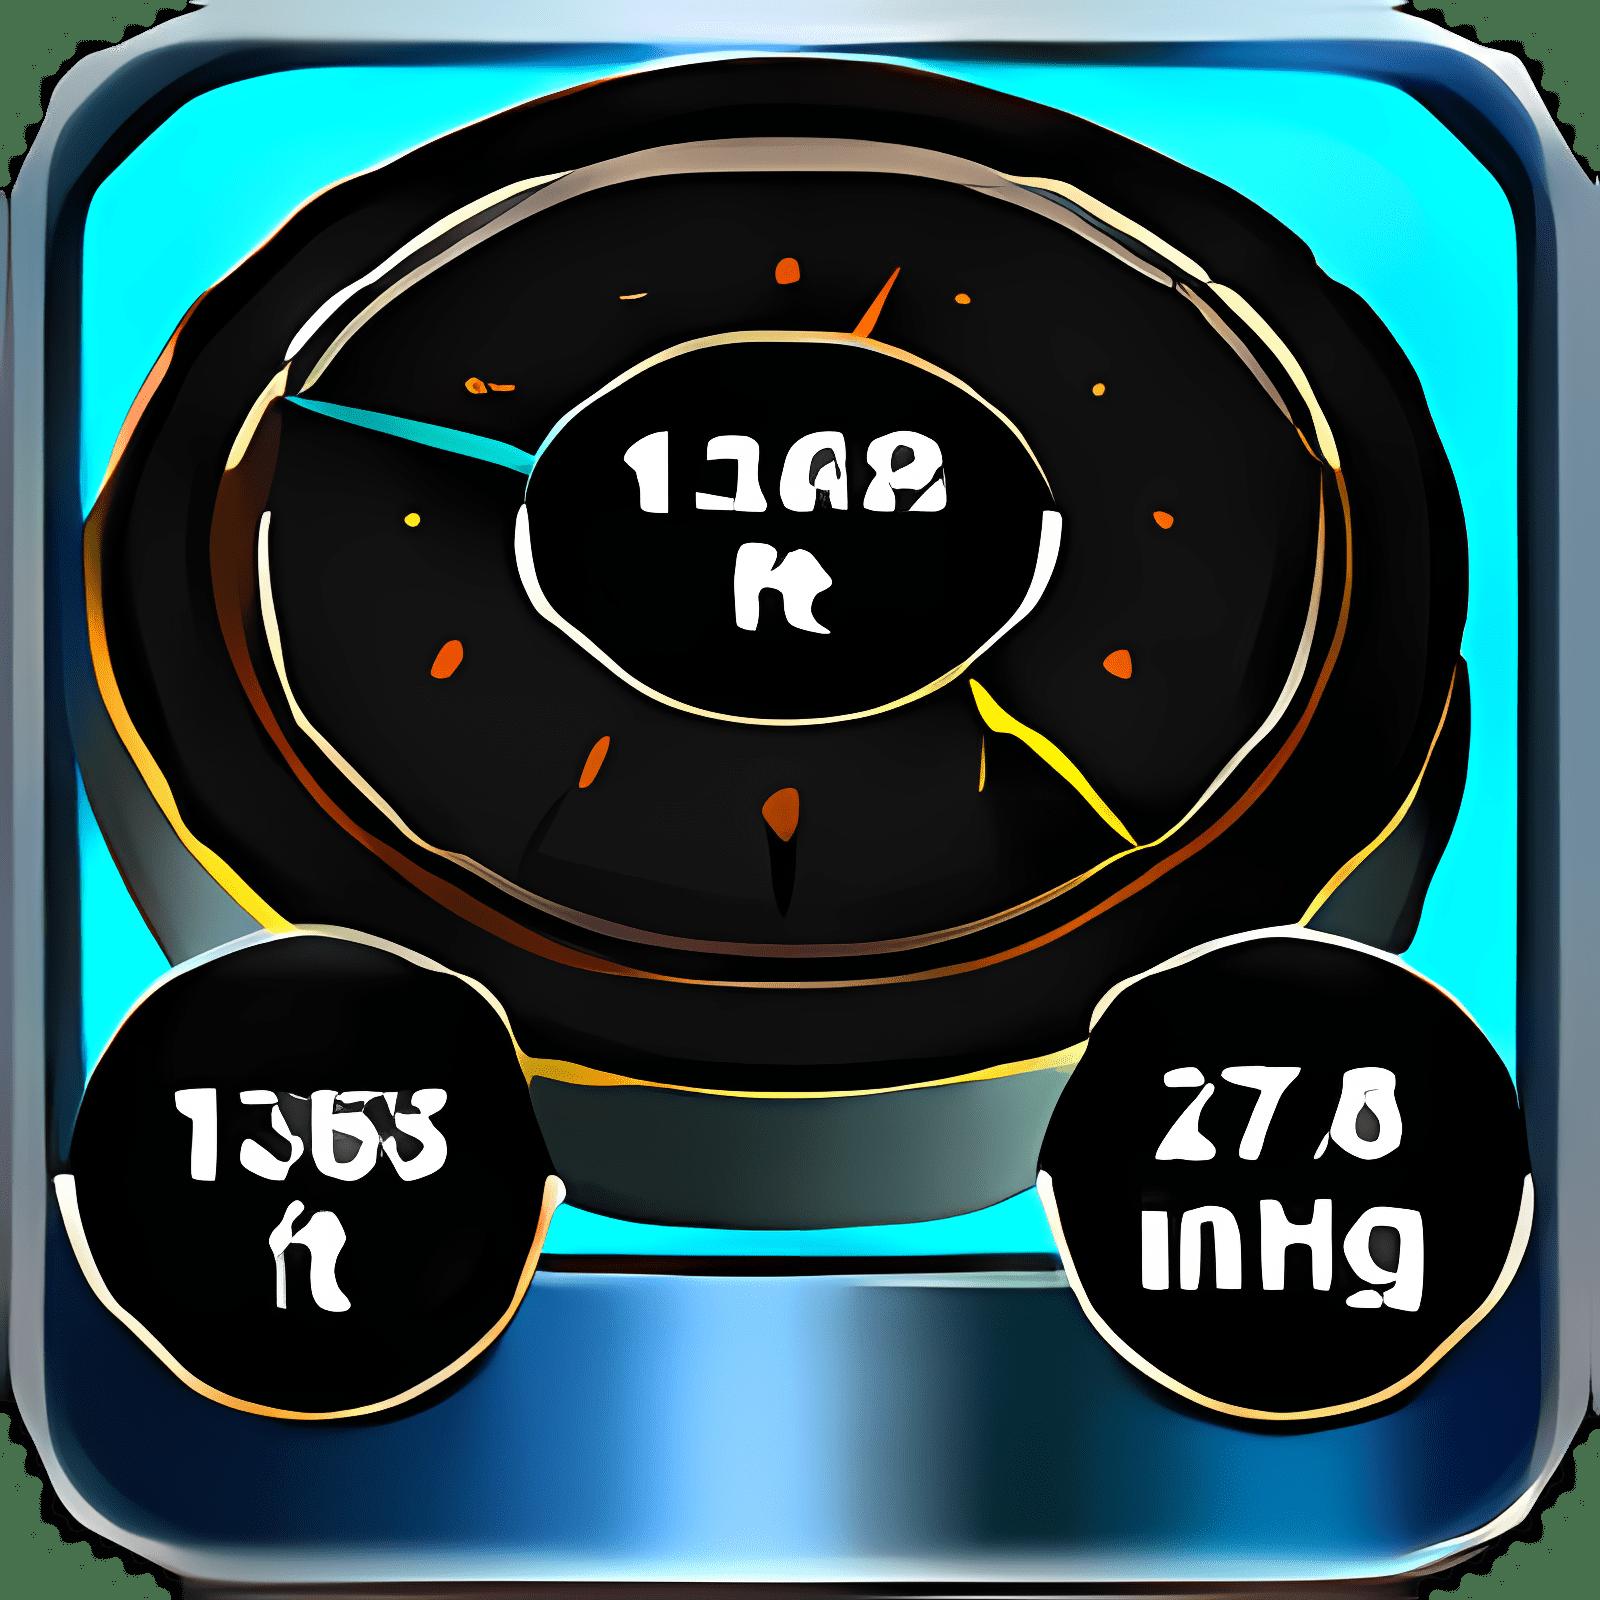 Accurate Altitude measurement 1.1